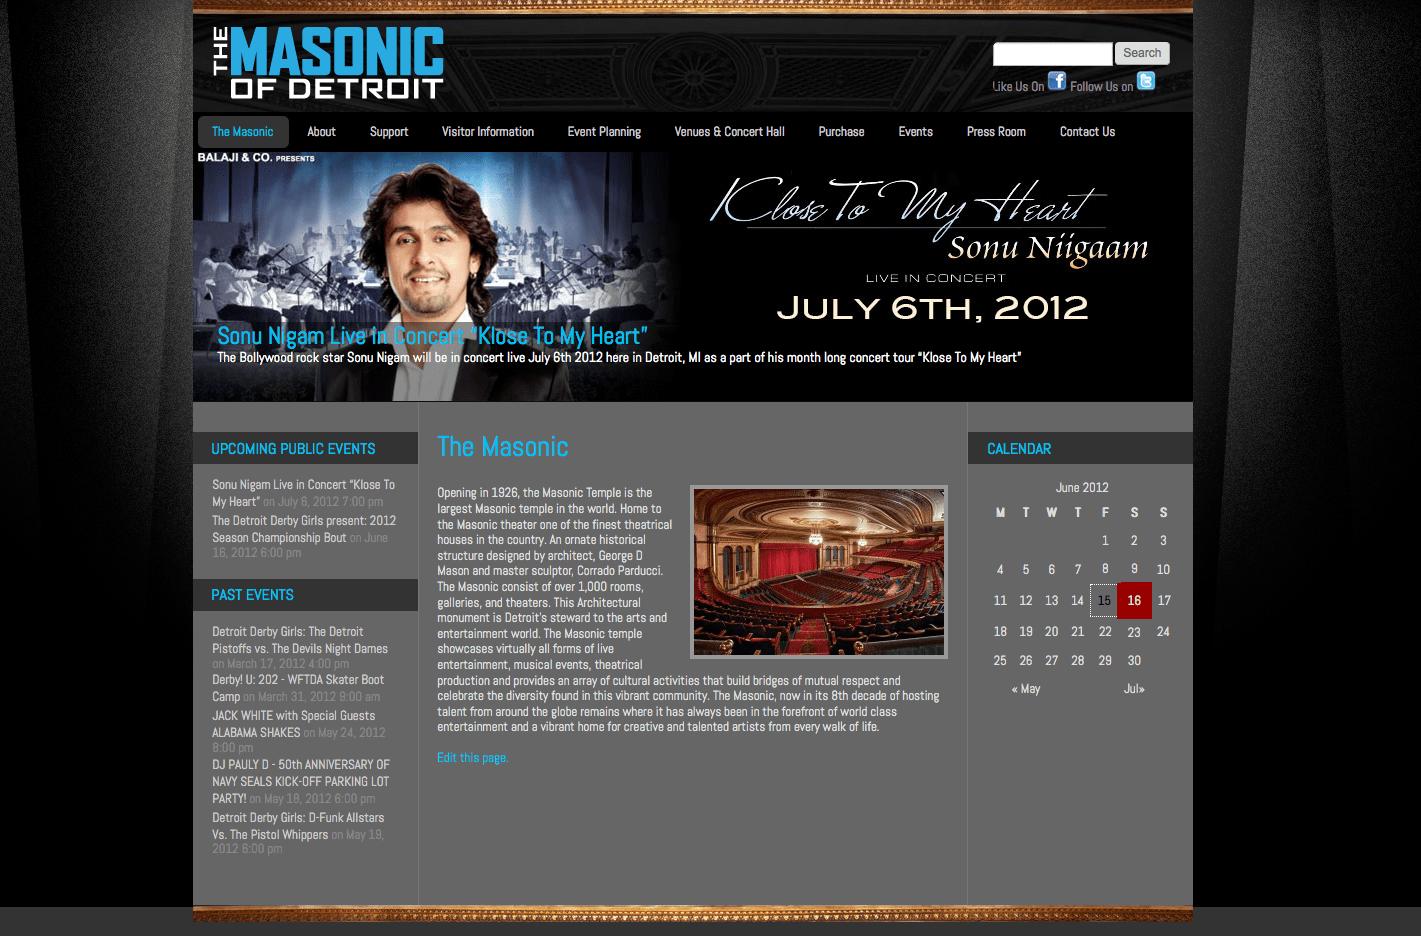 The Masonic of Detroit web site